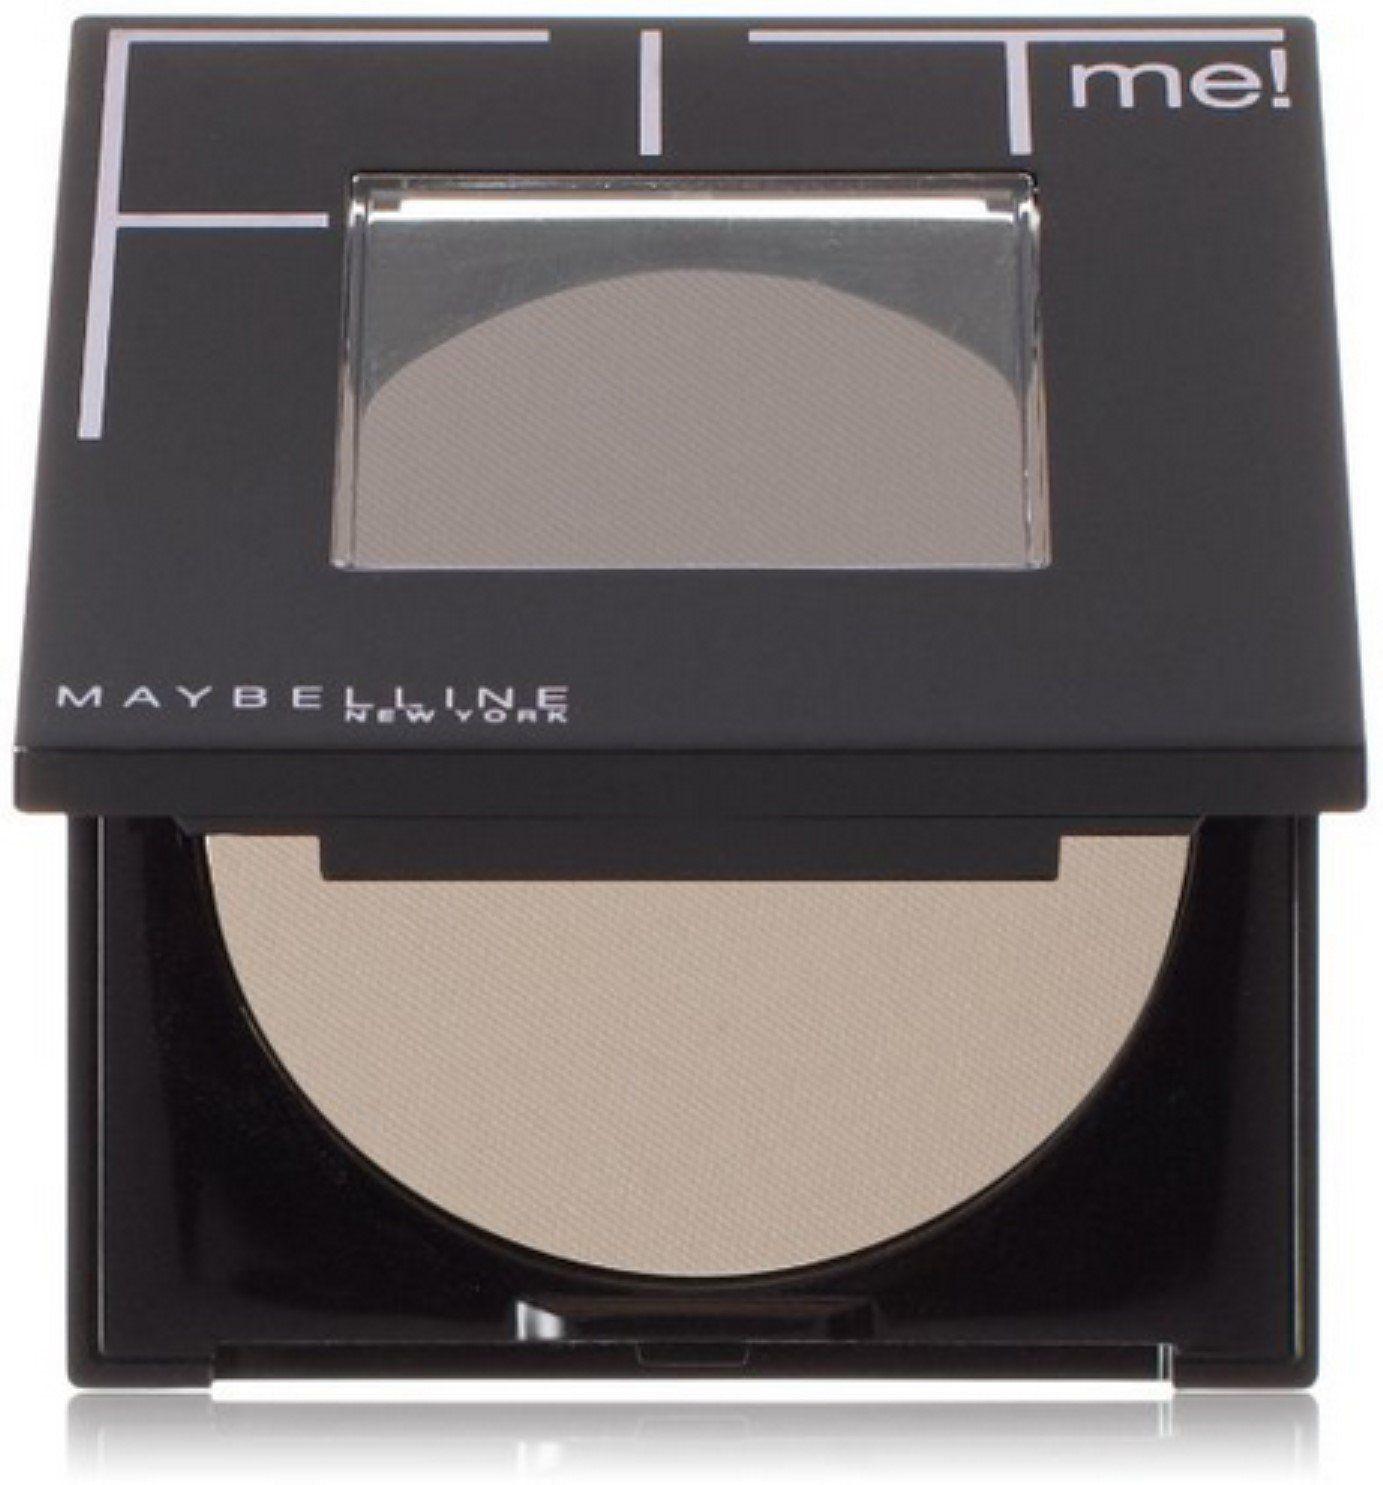 Maybelline New York Fit Me! Pressed Powder, Ivory [115] 0